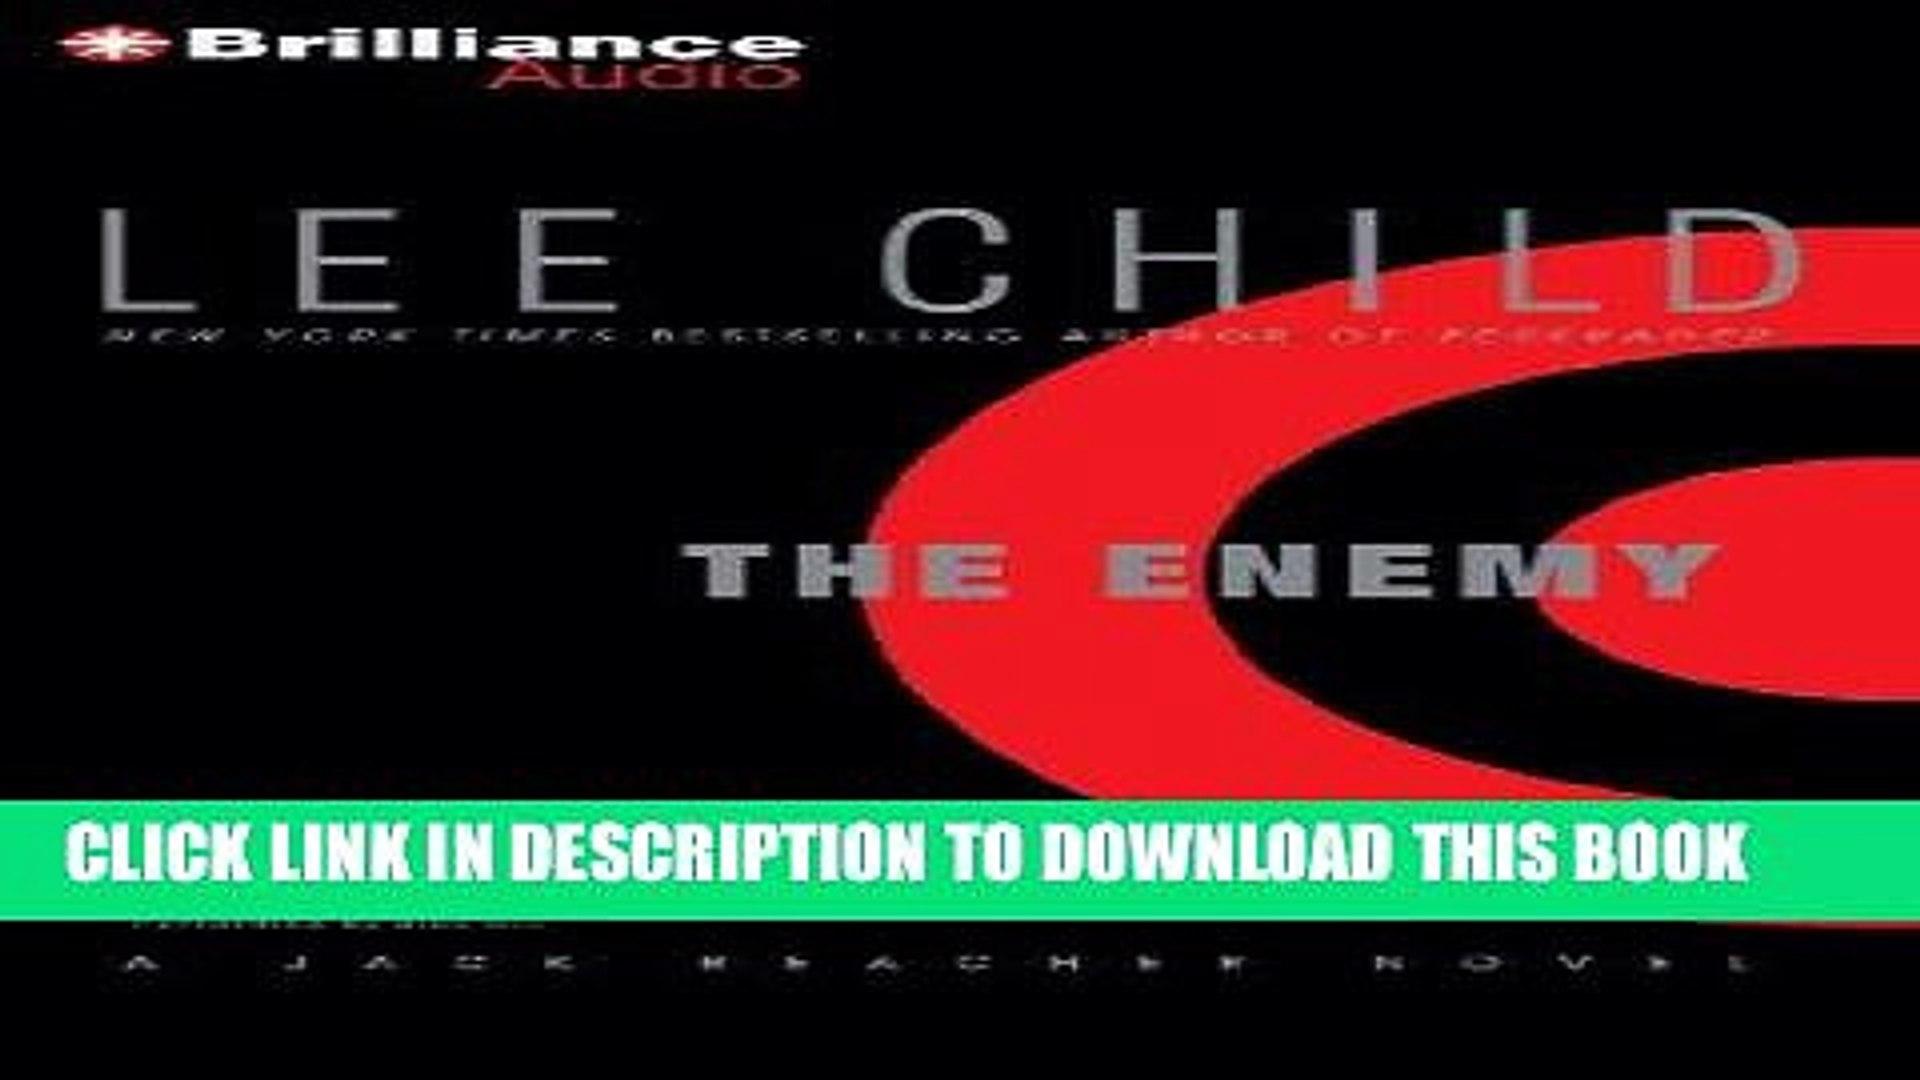 lee child download